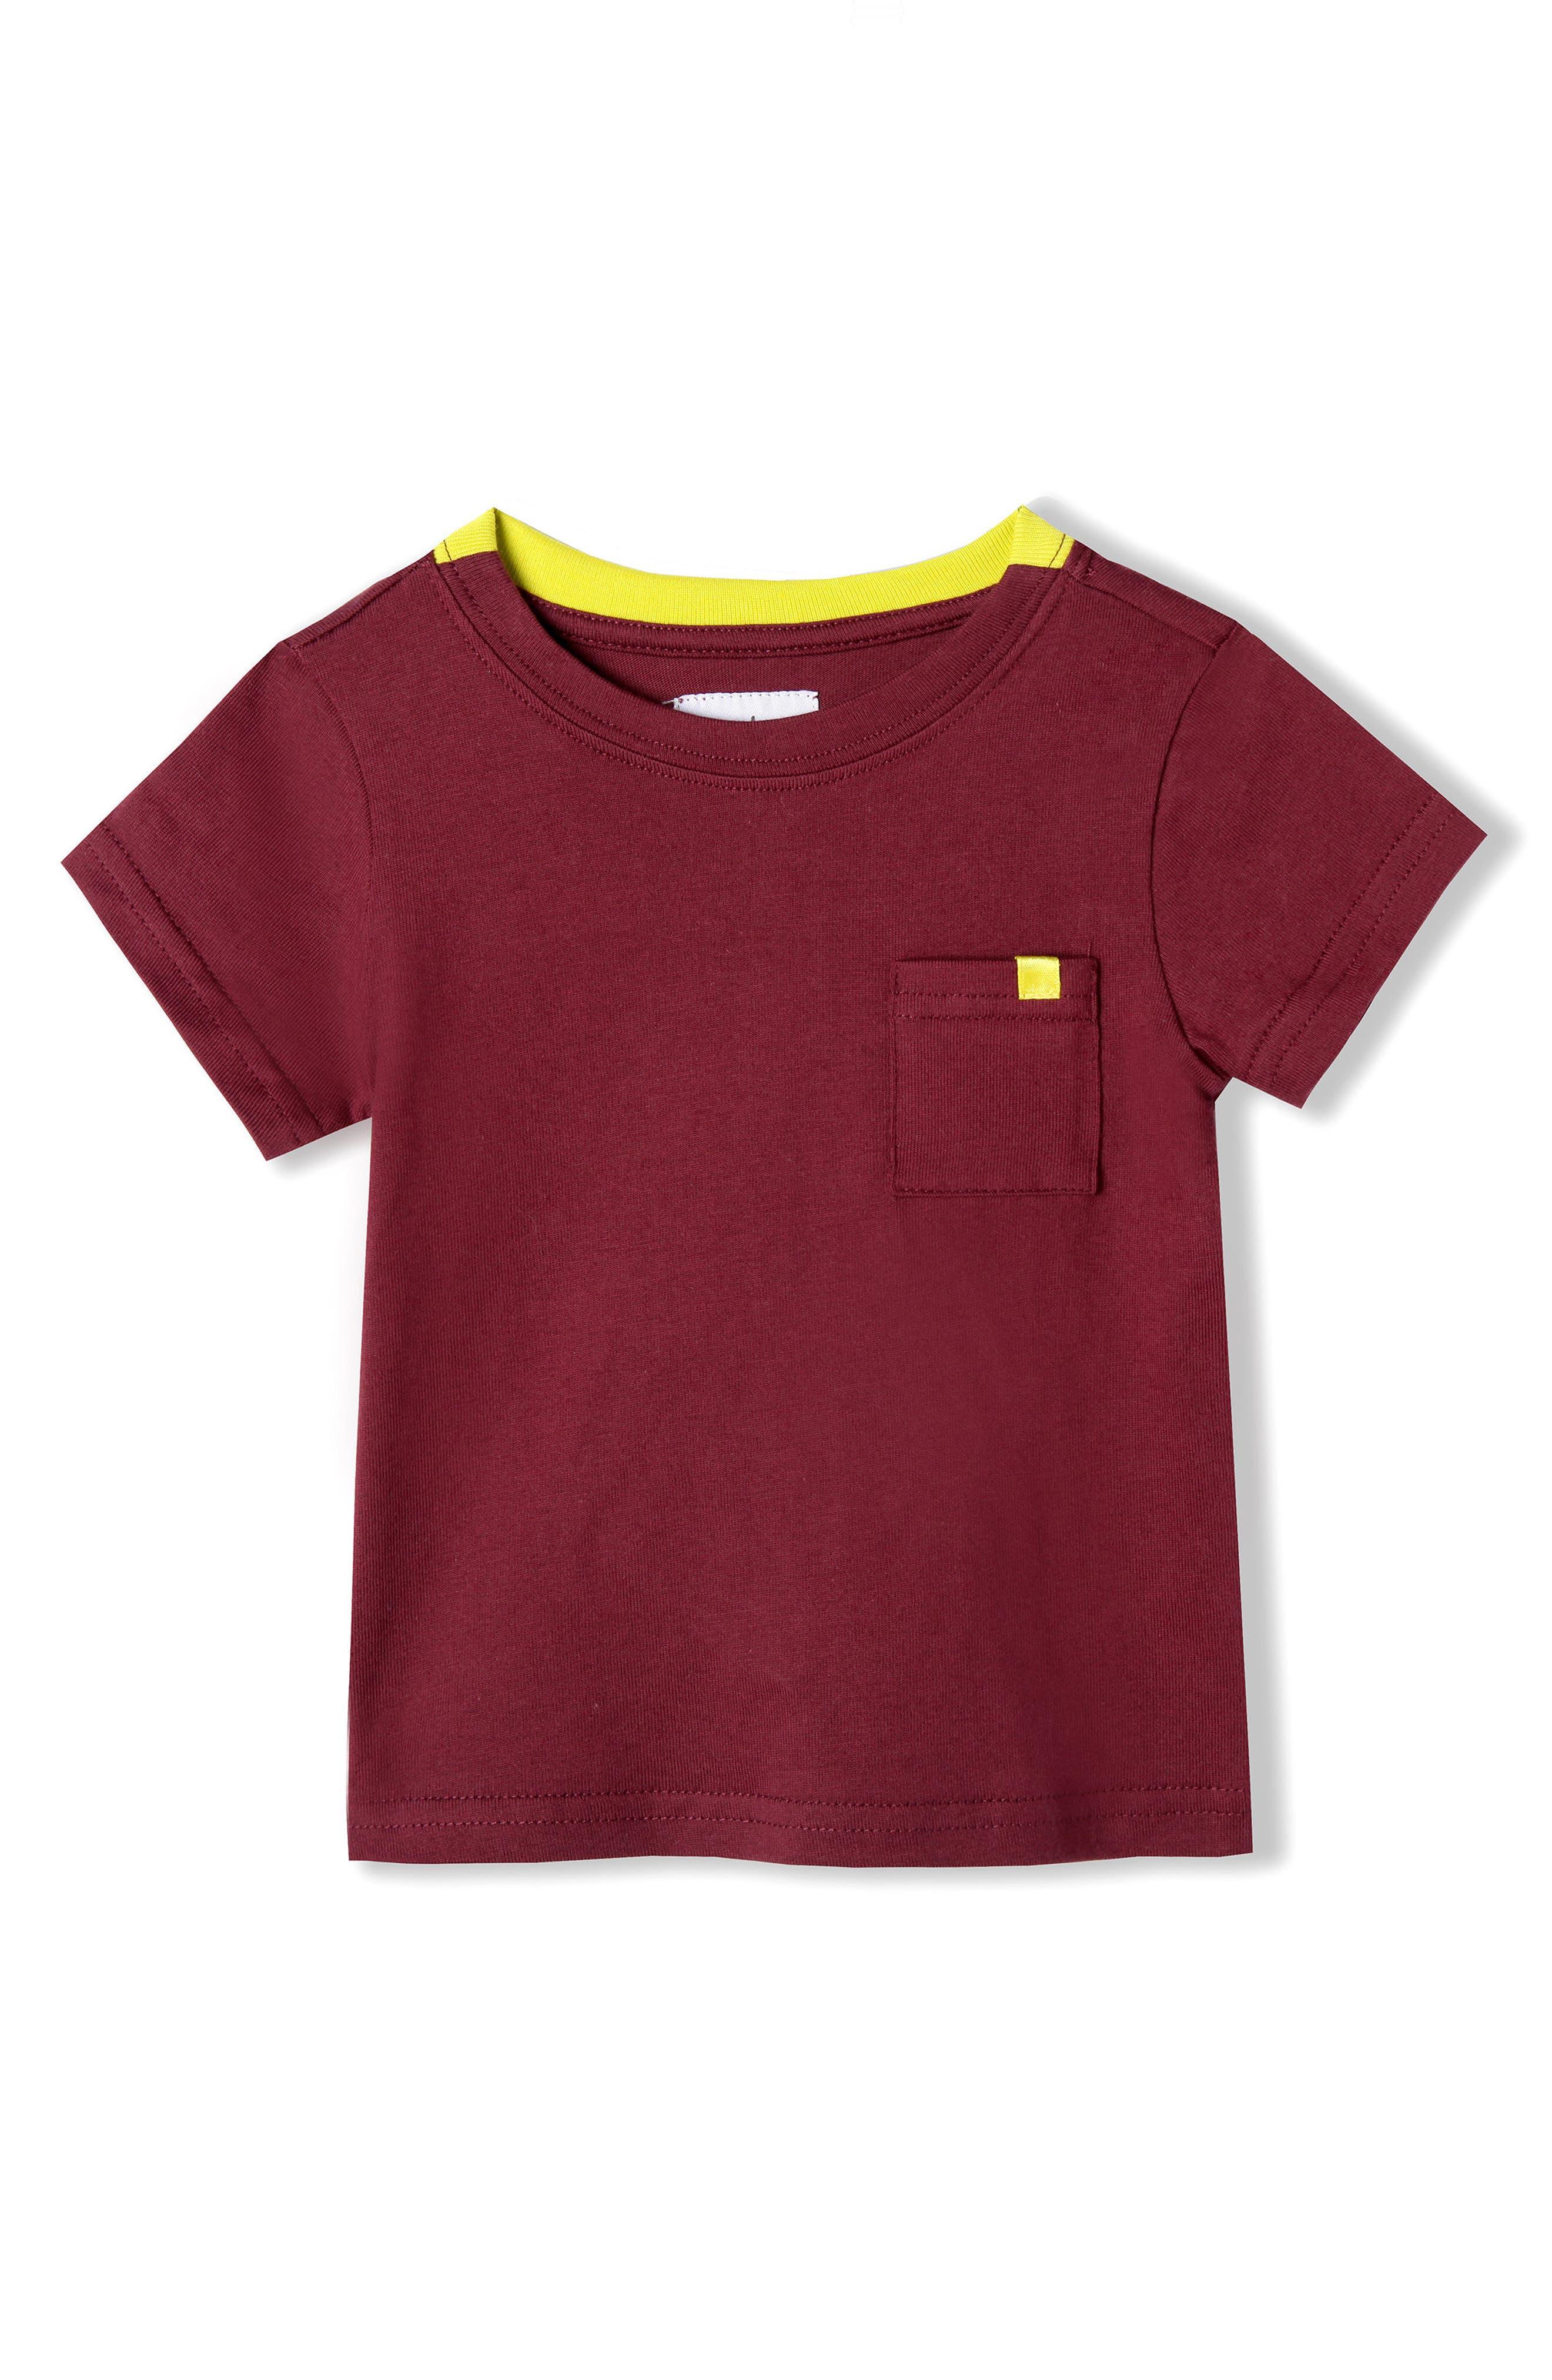 Alternate Image 1 Selected - Art & Eden Organic Cotton T-Shirt (Baby Boys)